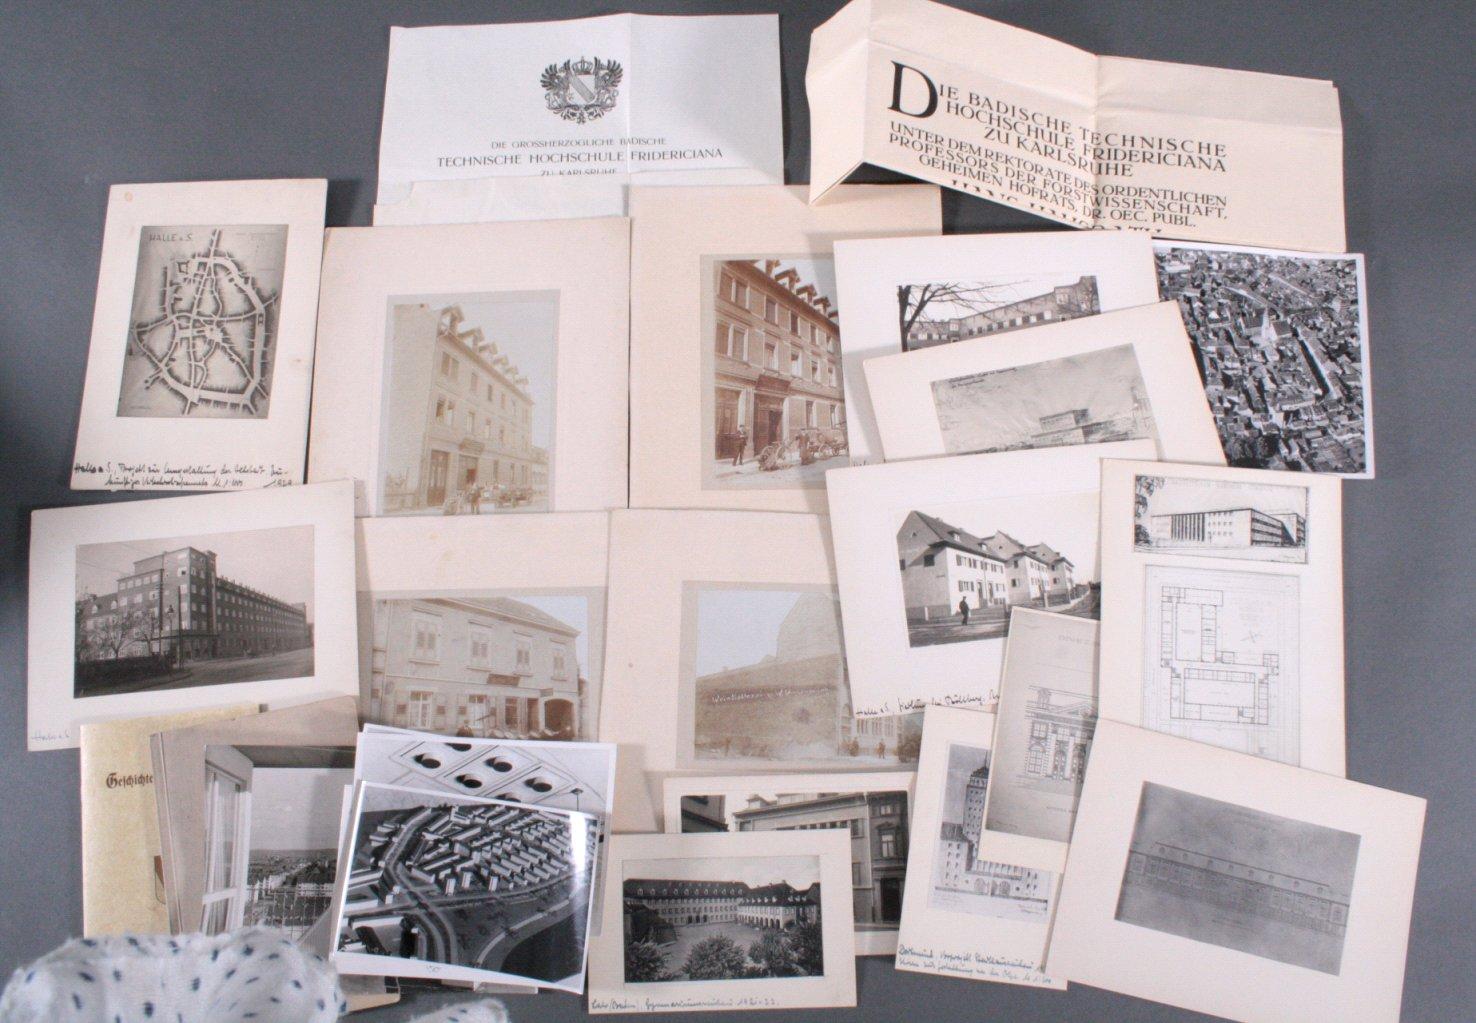 Papier und Fotonachlass